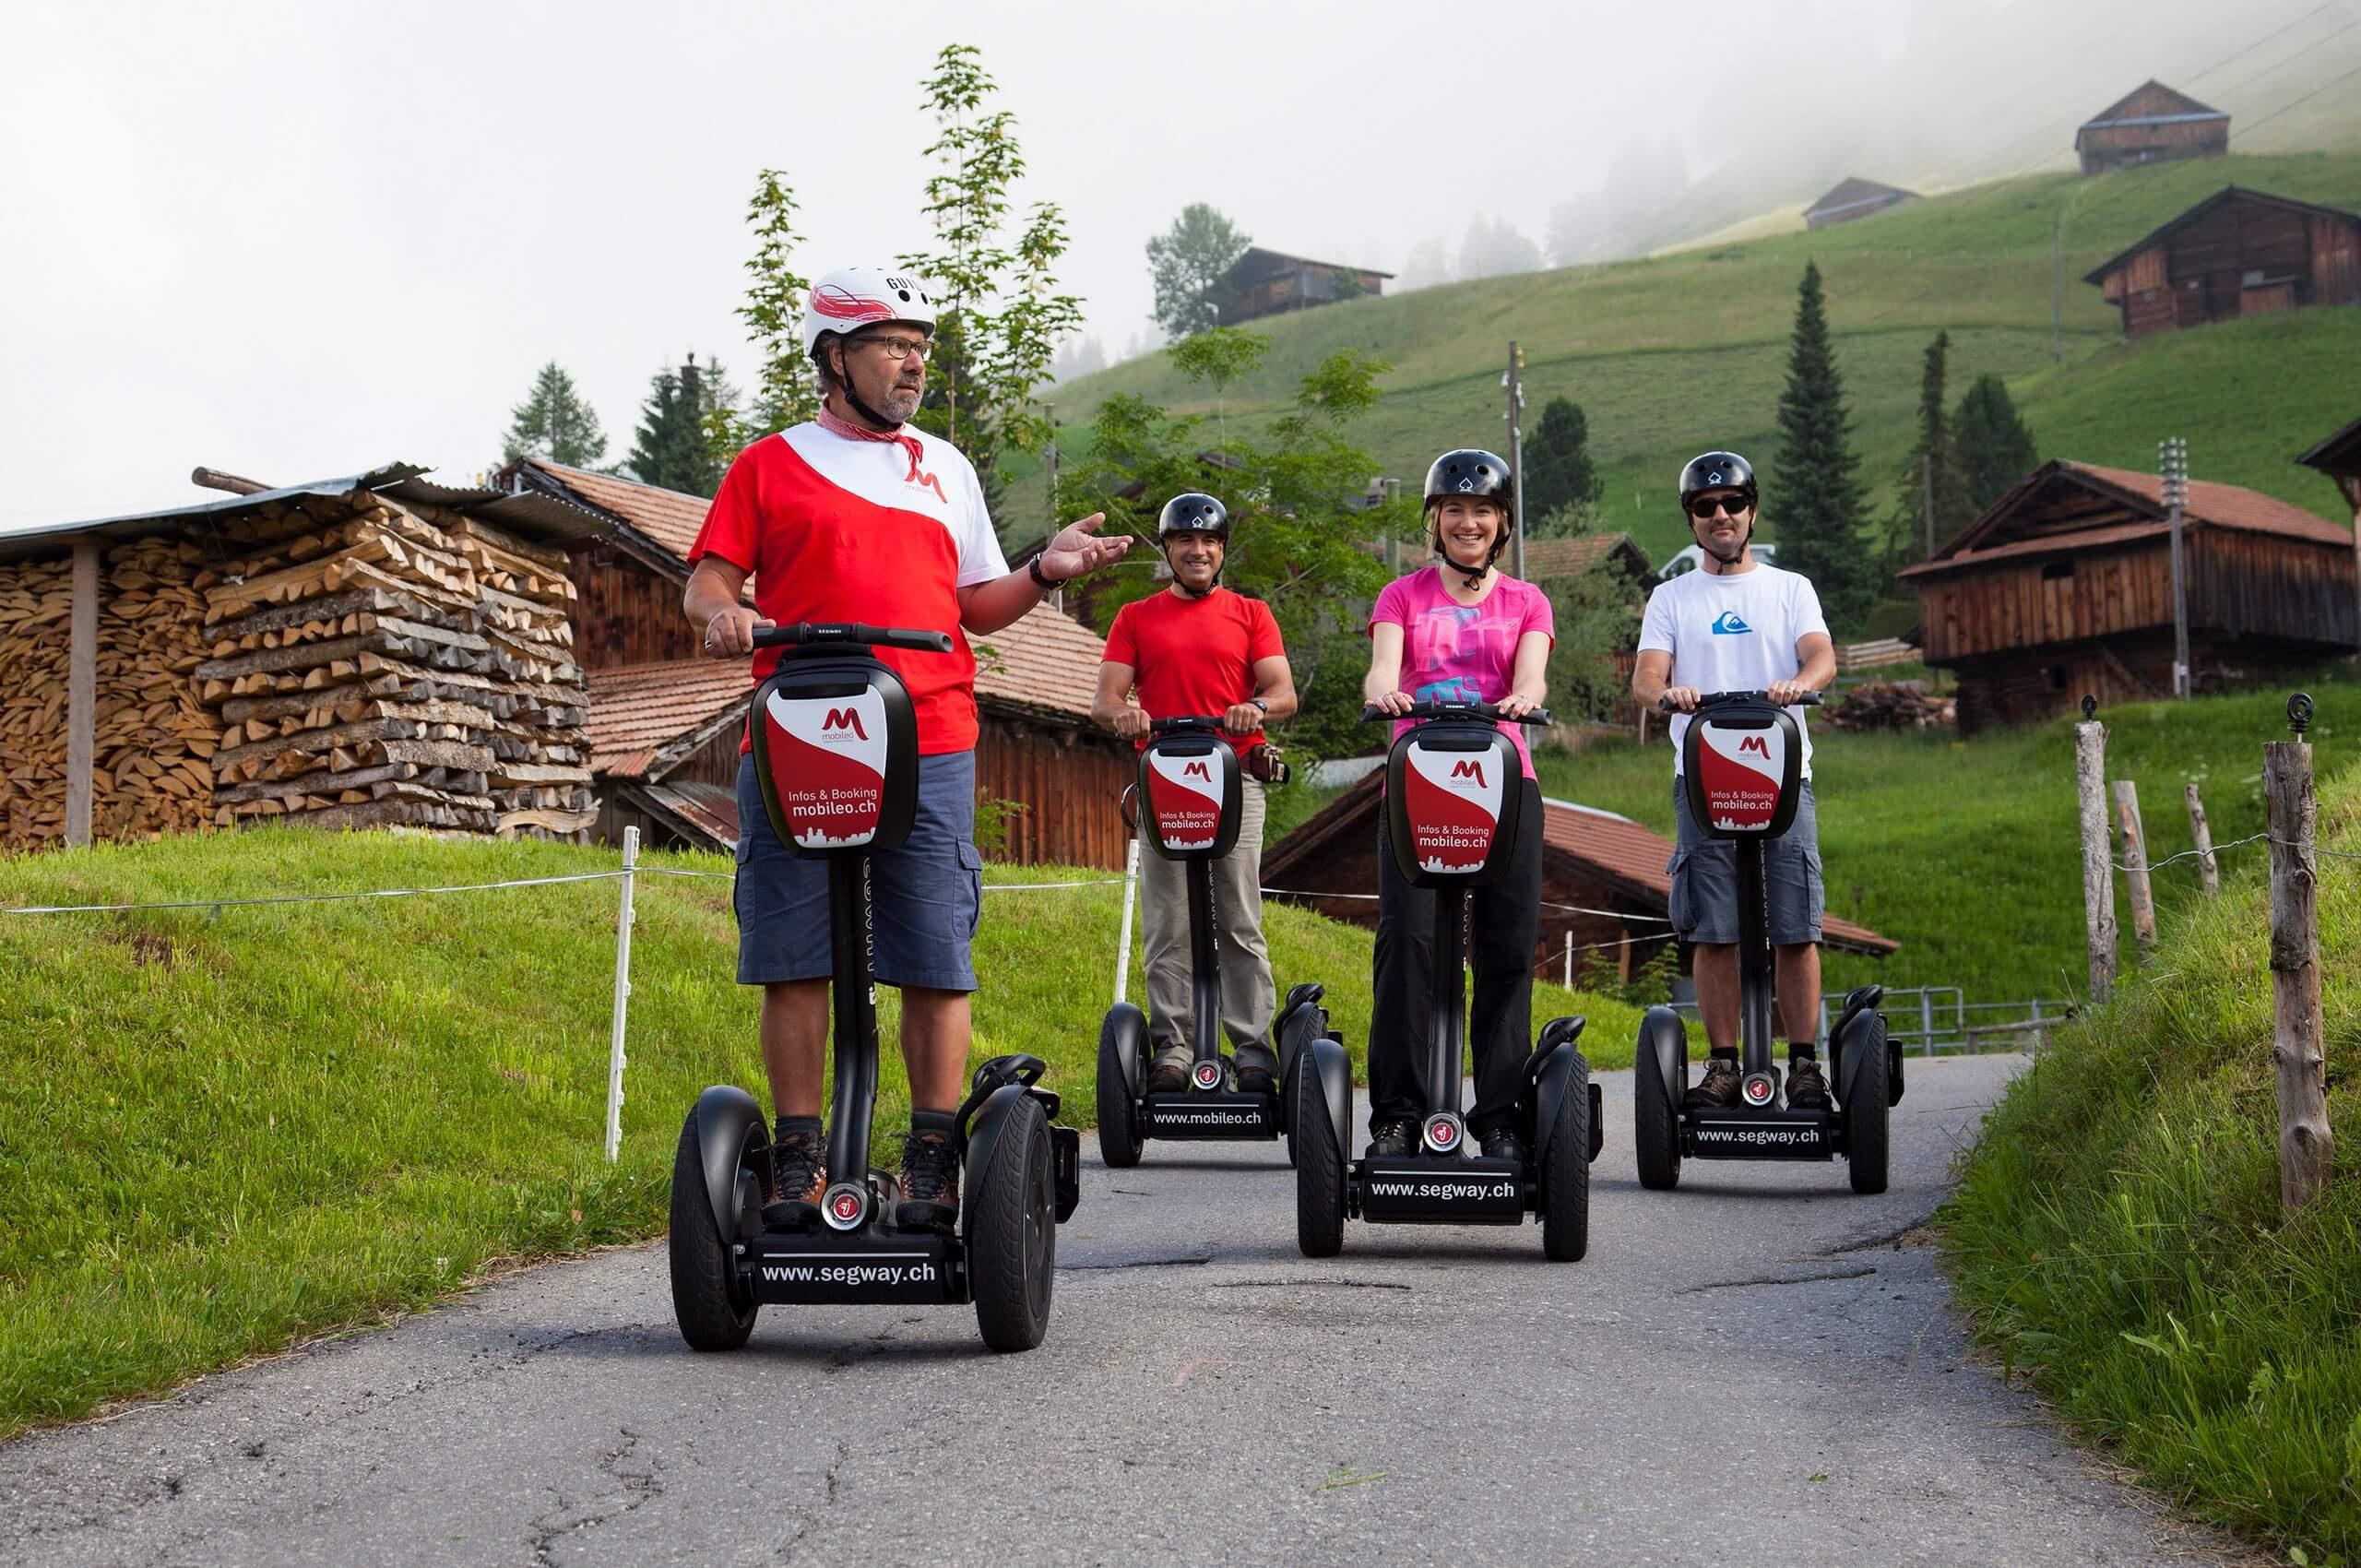 interlaken-segway-sommer-tour-landschaft